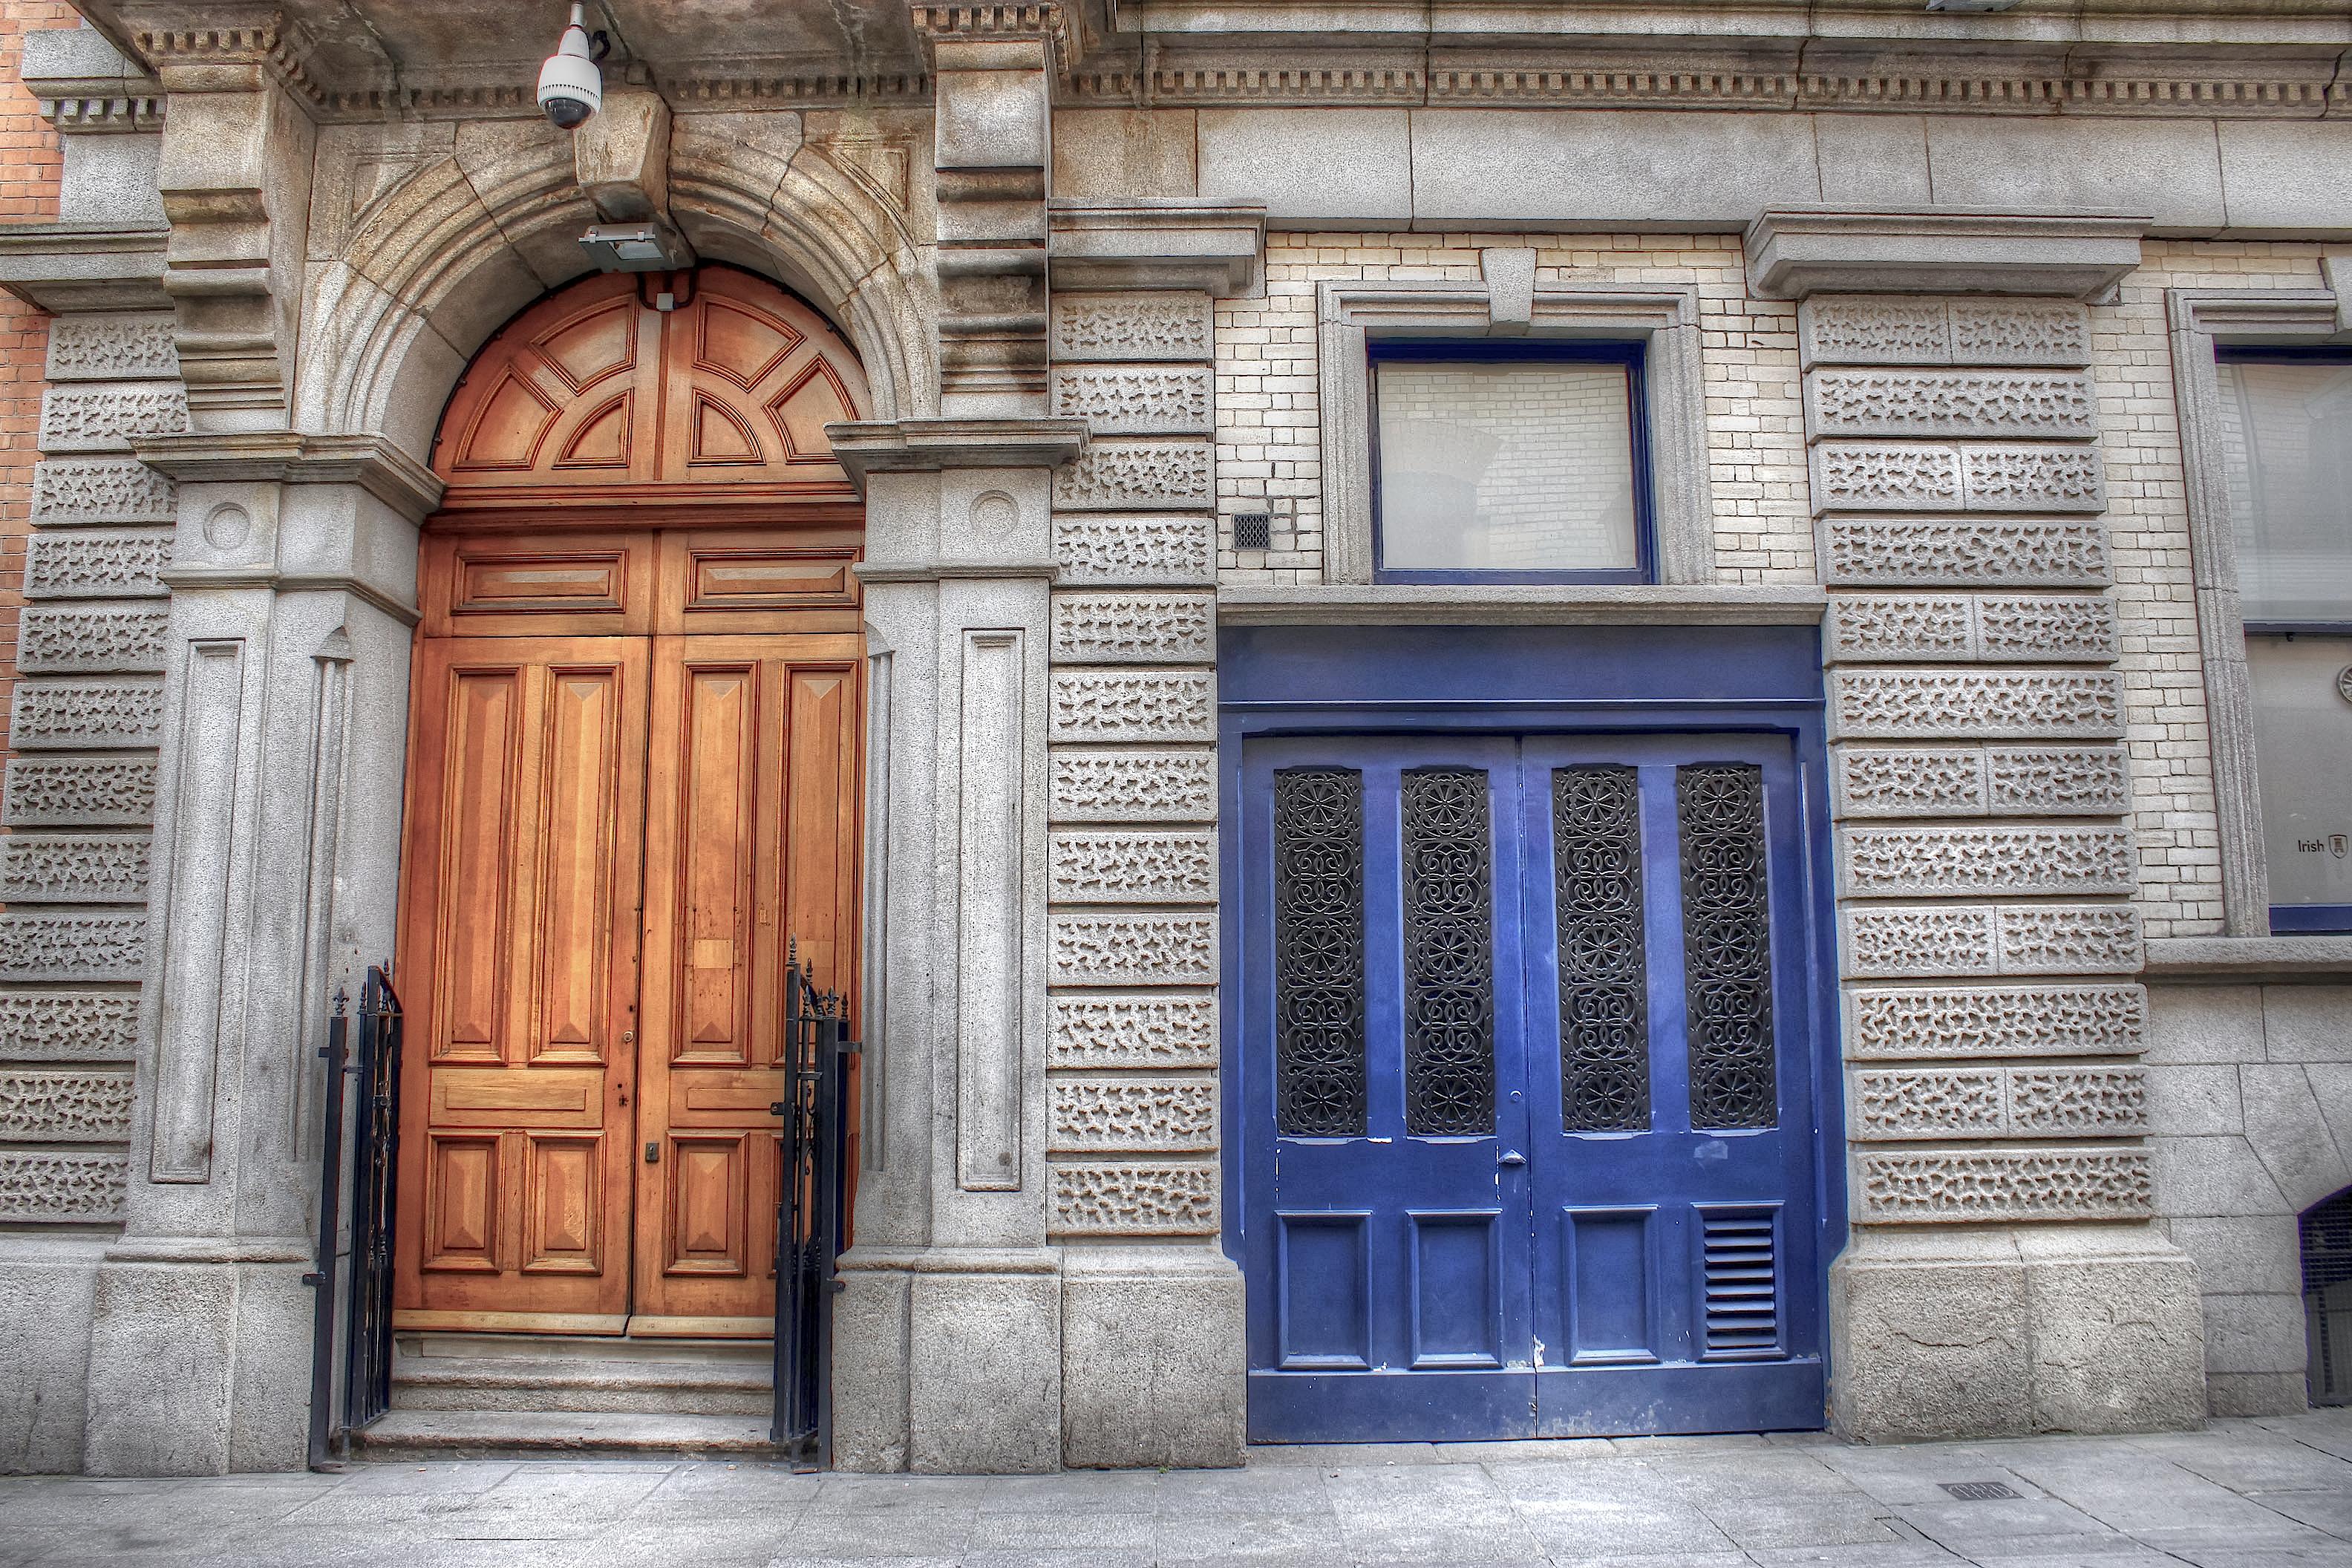 FileTwo doors (8114214235).jpg & File:Two doors (8114214235).jpg - Wikimedia Commons